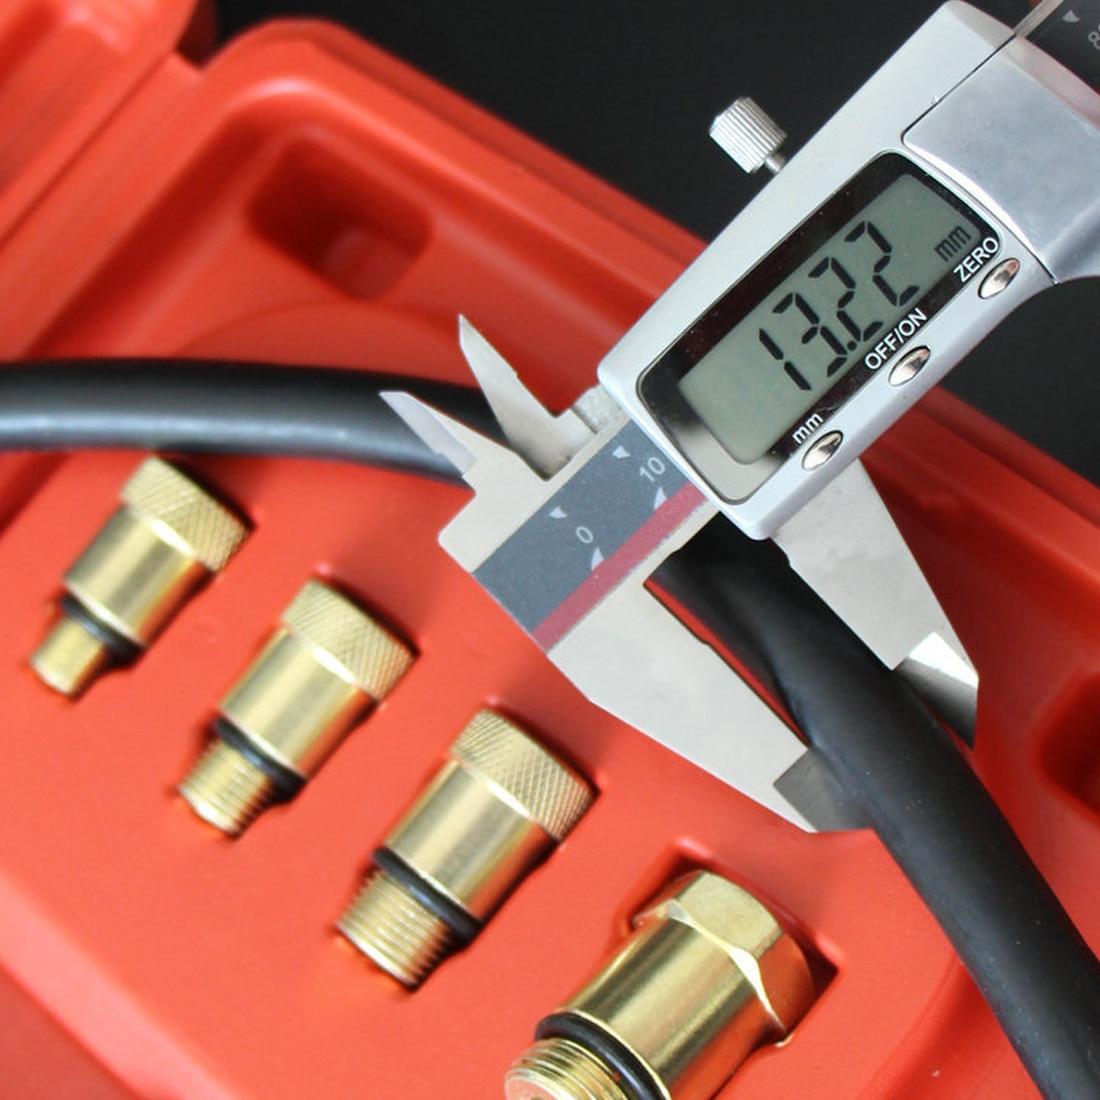 9 stücke Benzin Gas Motor Zylinder Kompressor Manometer Meter Test Druck Compression Tester Leckage Diagnose Werkzeug